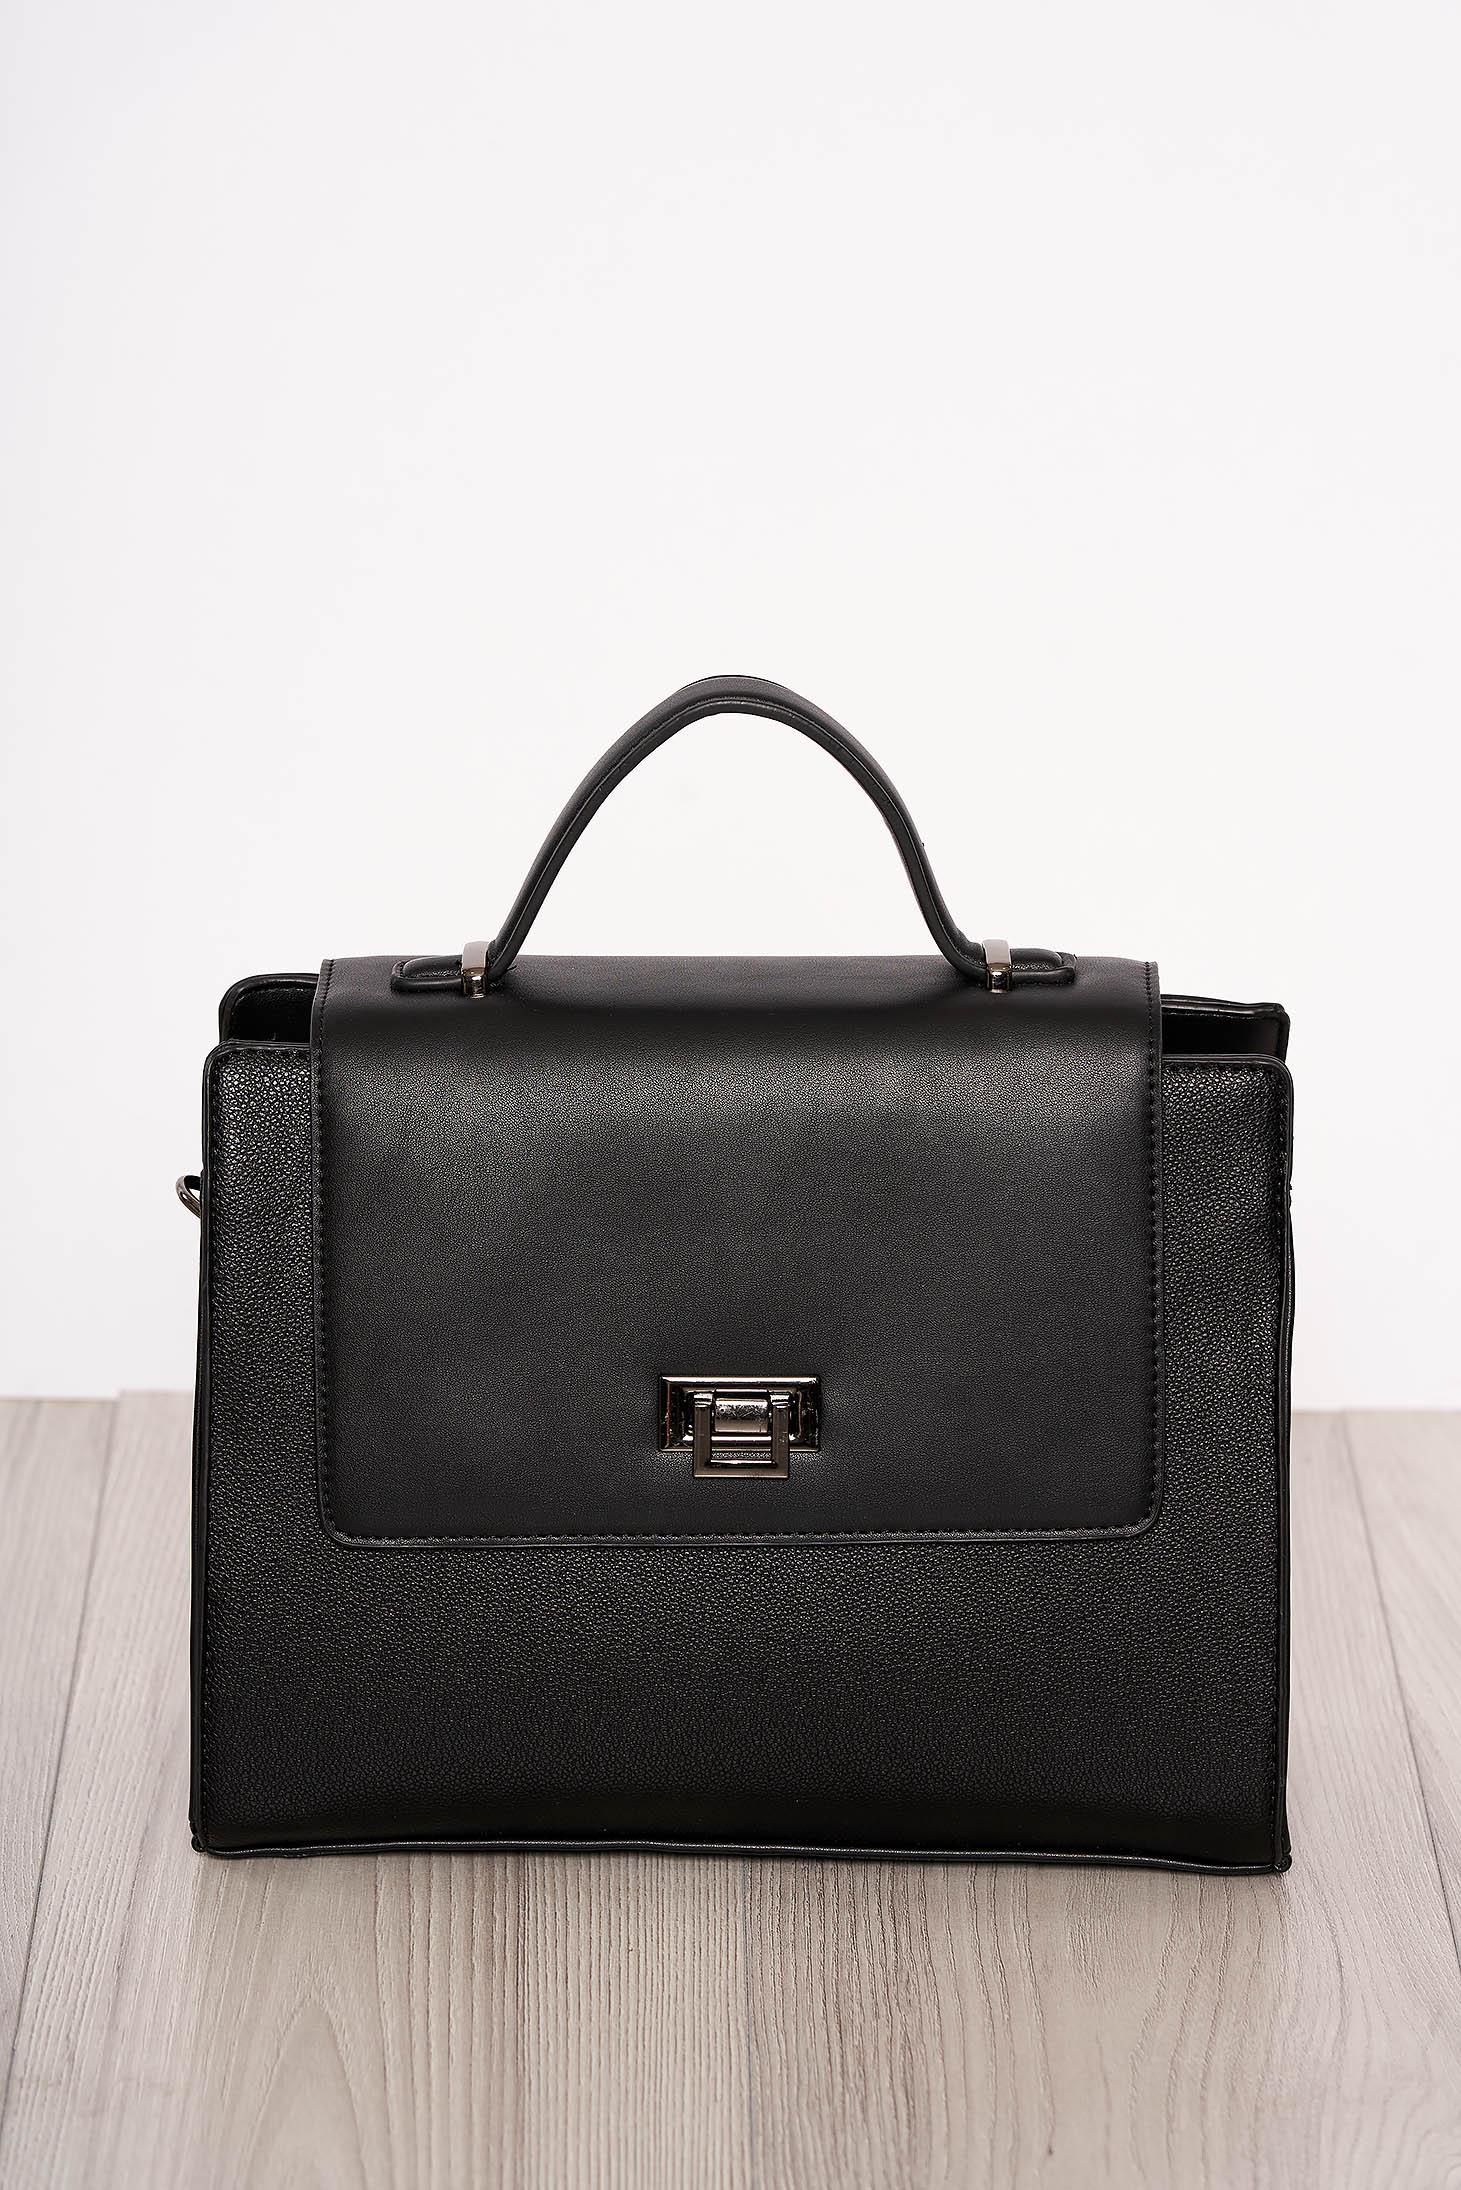 Black bag elegant faux leather short handle and long chain handle